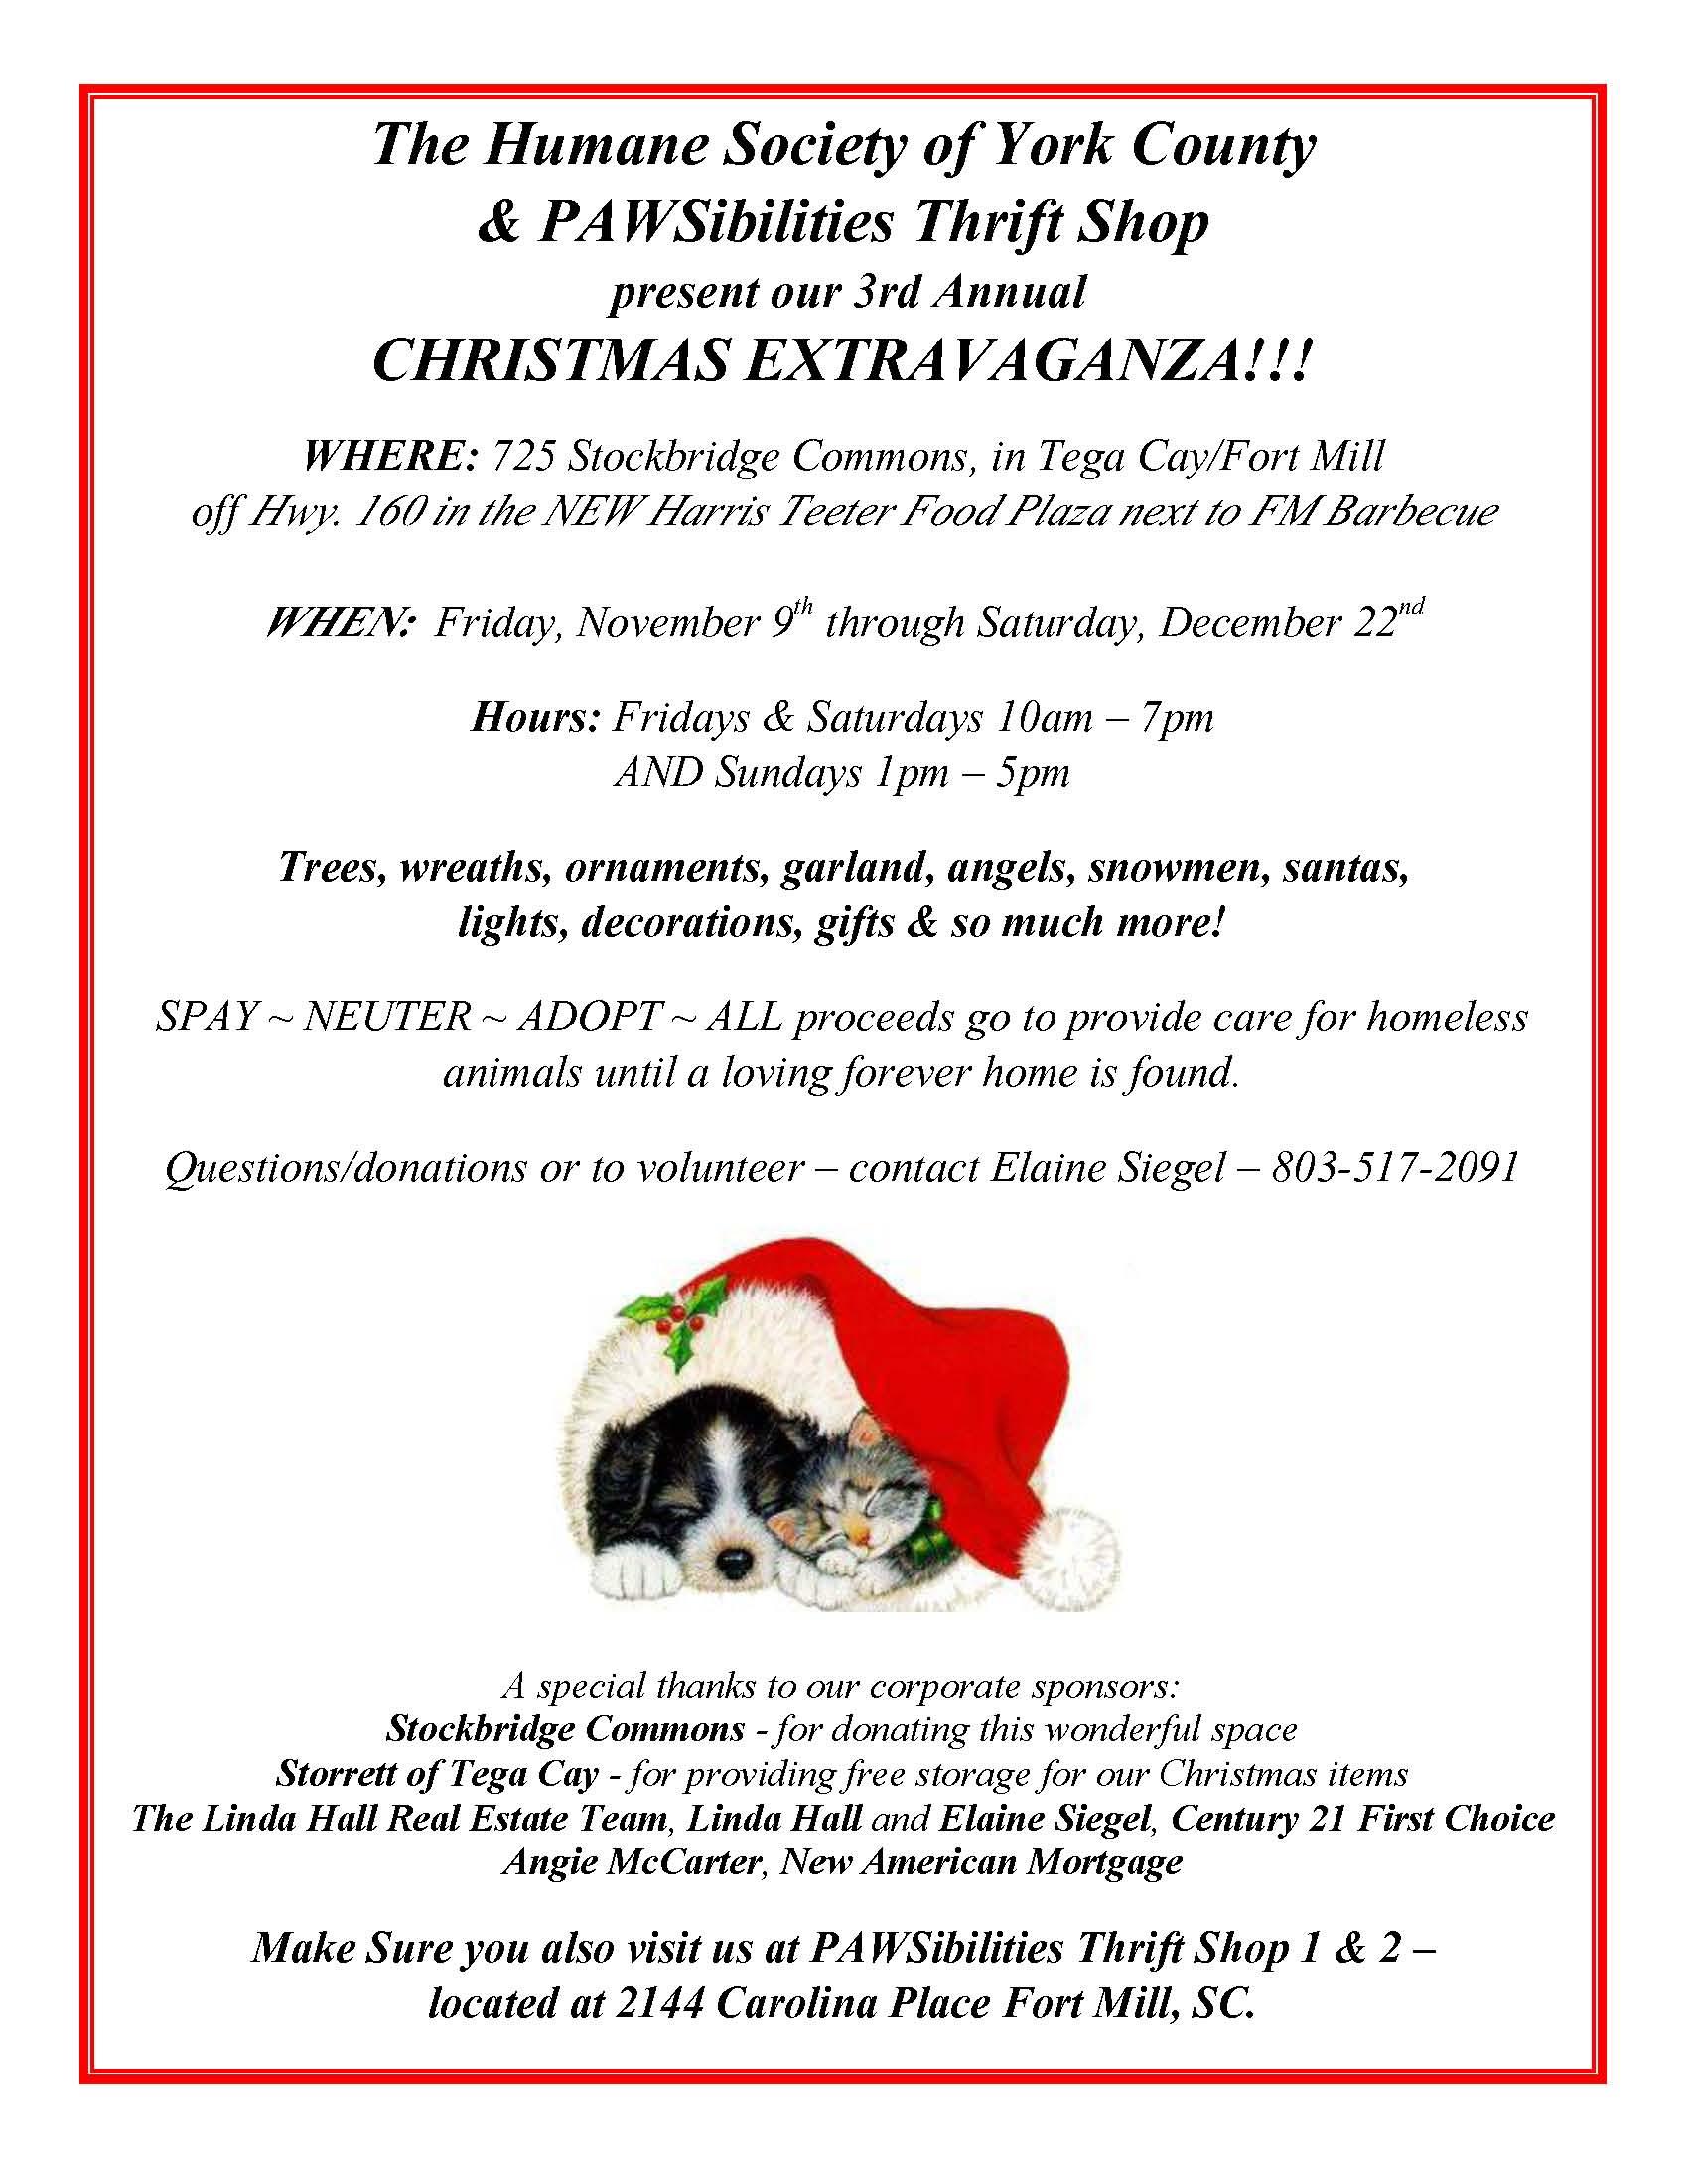 PAWSibilities Christmas Store Opens Nov 9 2012 | See Tega Cay South ...